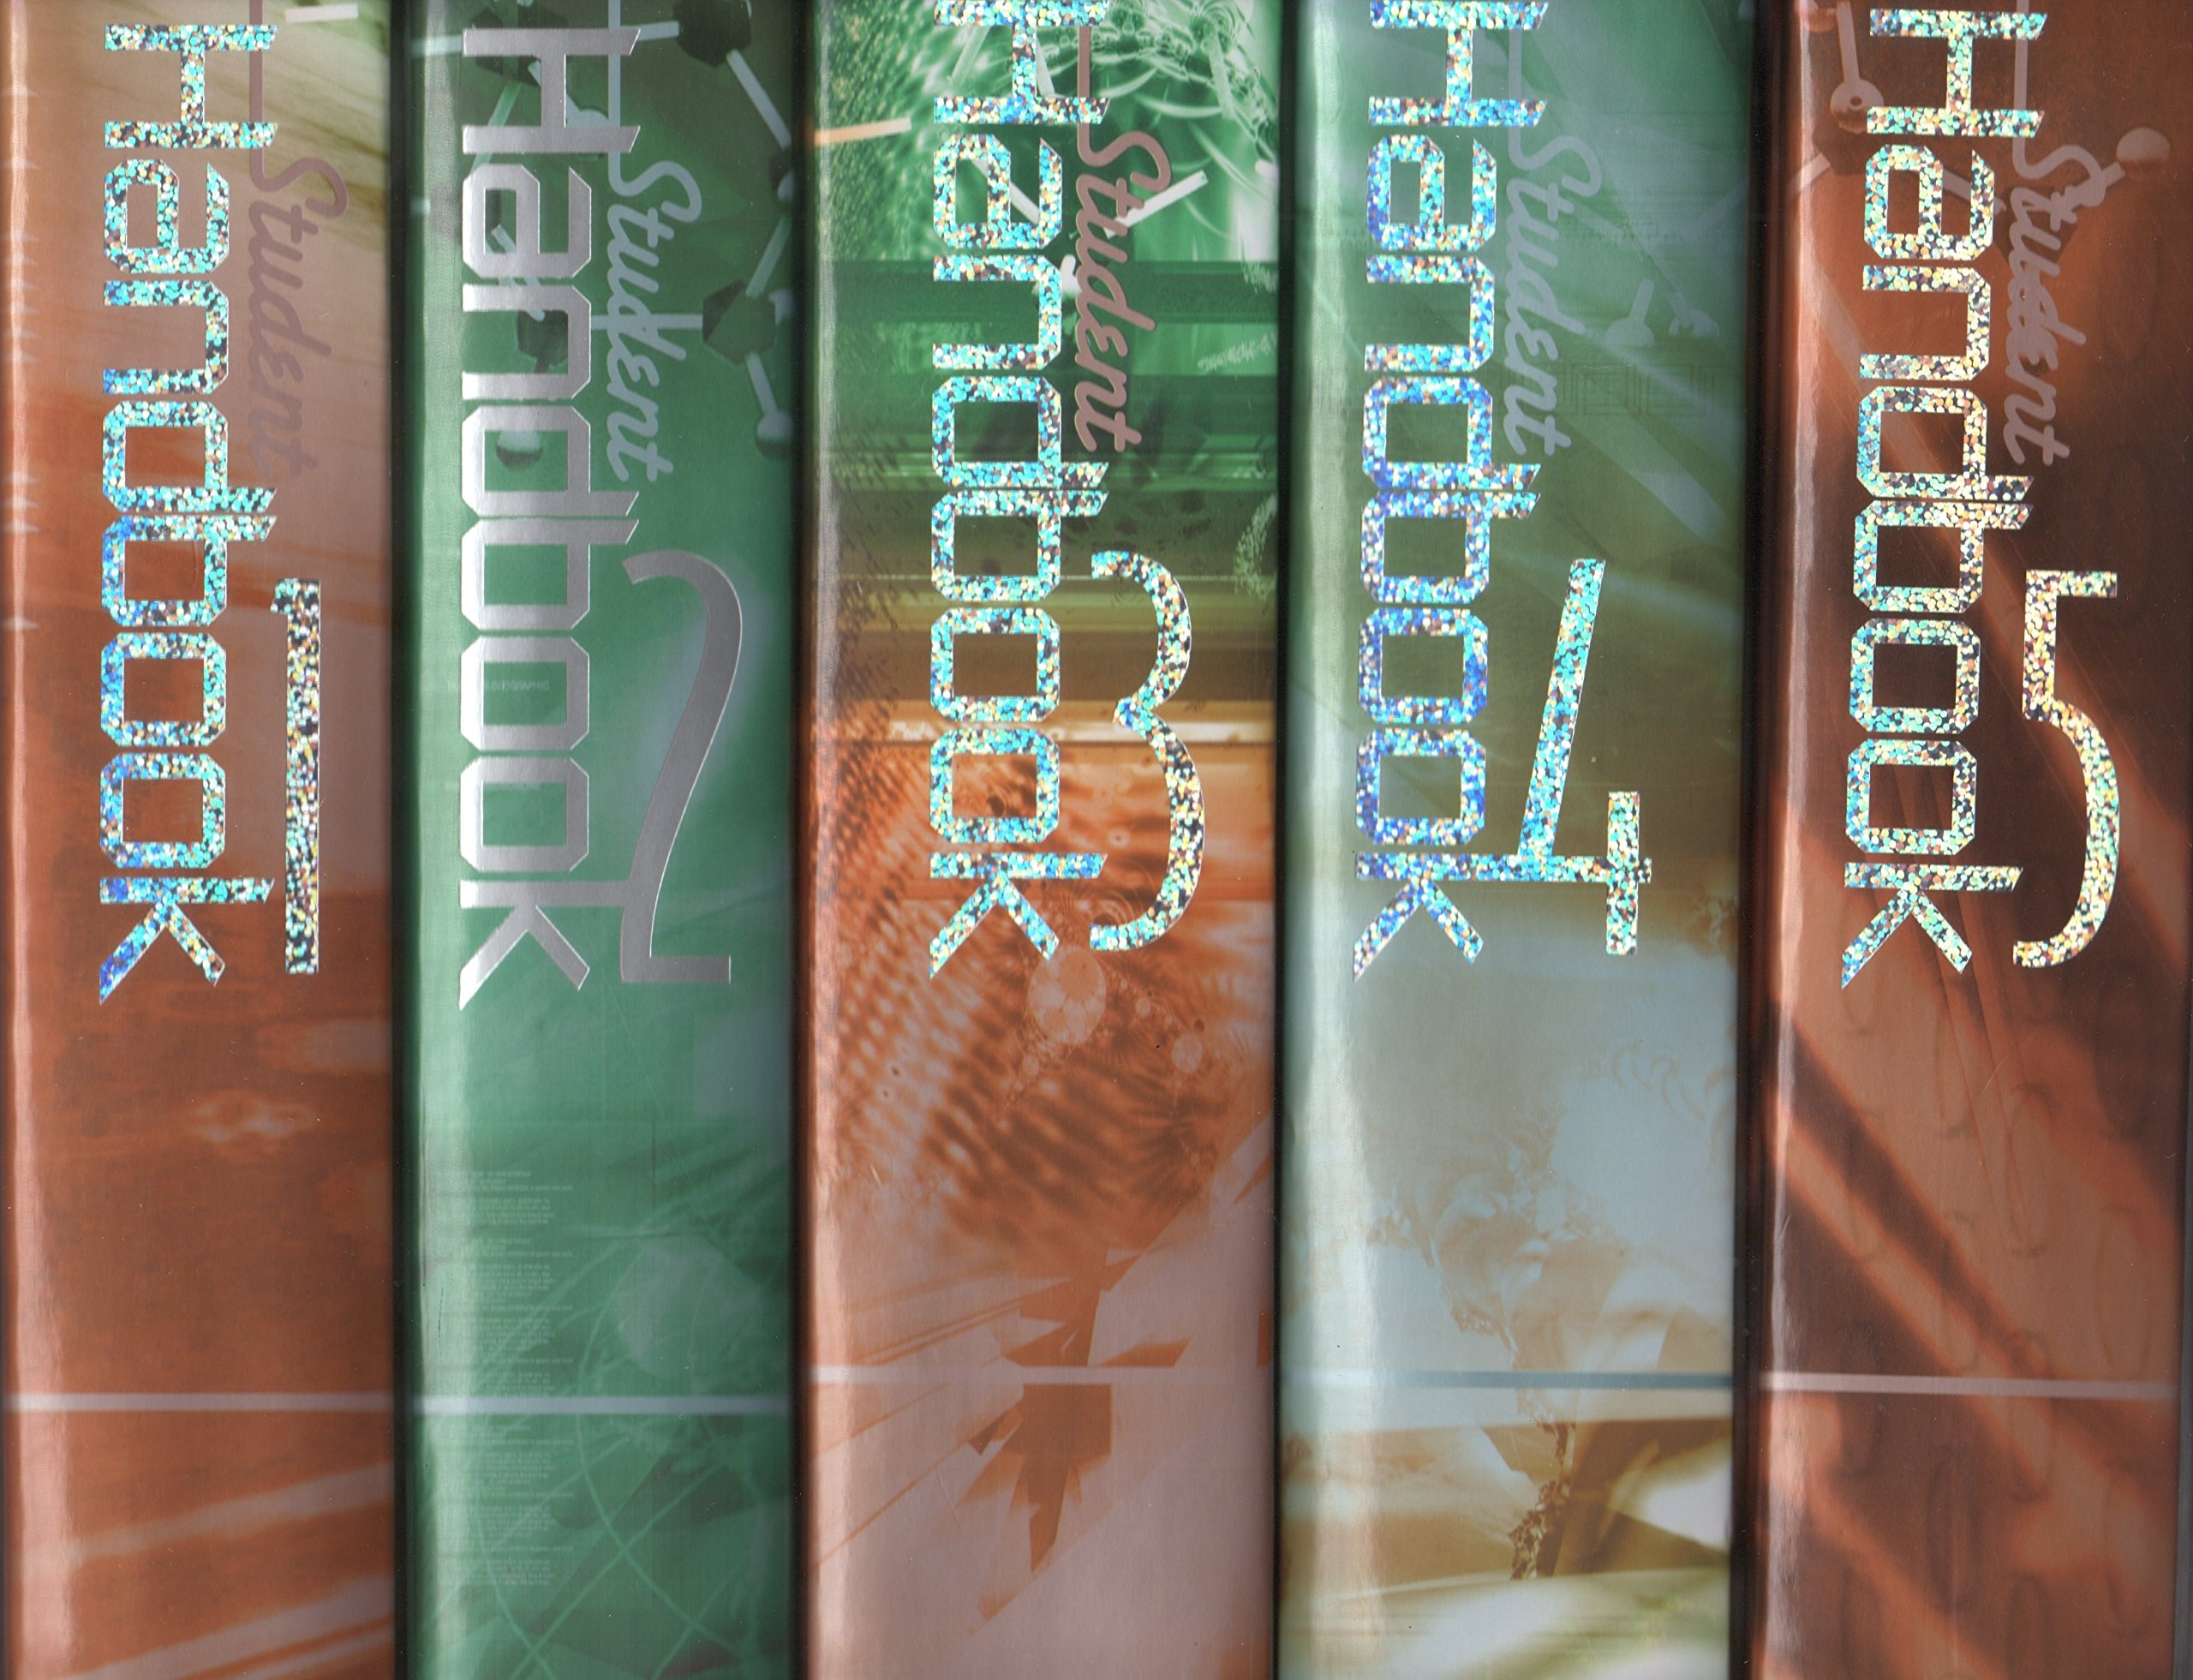 STUDENT HANDBOOK VOLUMES 1-5, 2005 EDITION pdf epub